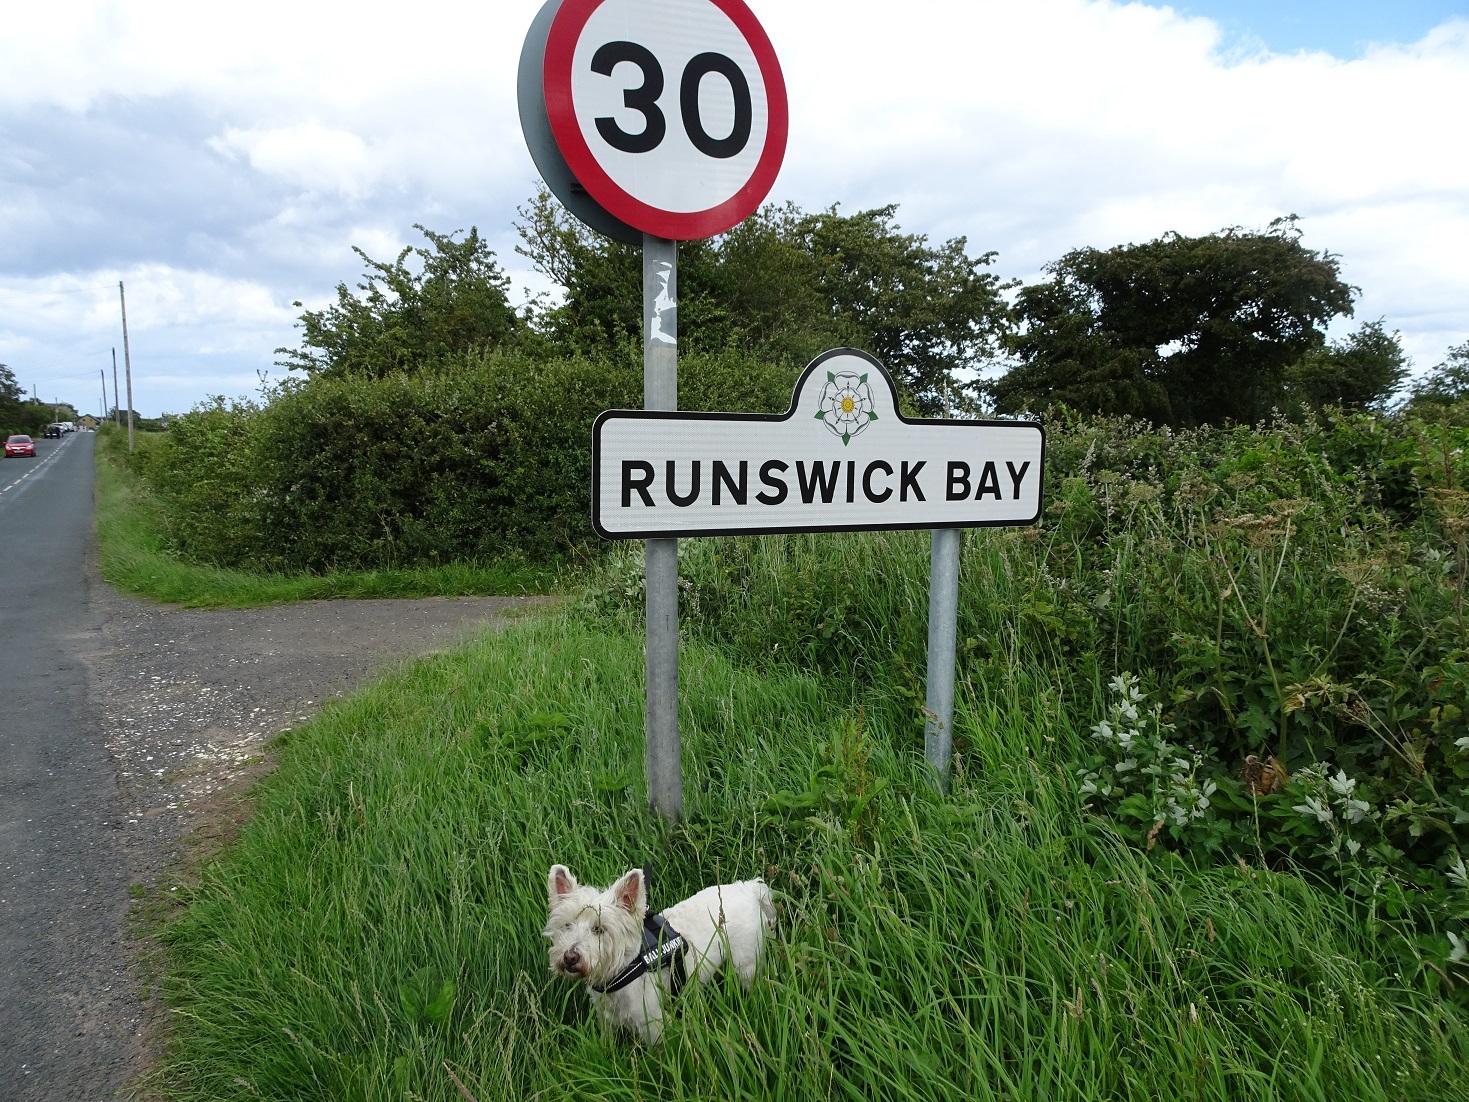 poppy the westie at start of runswick bay